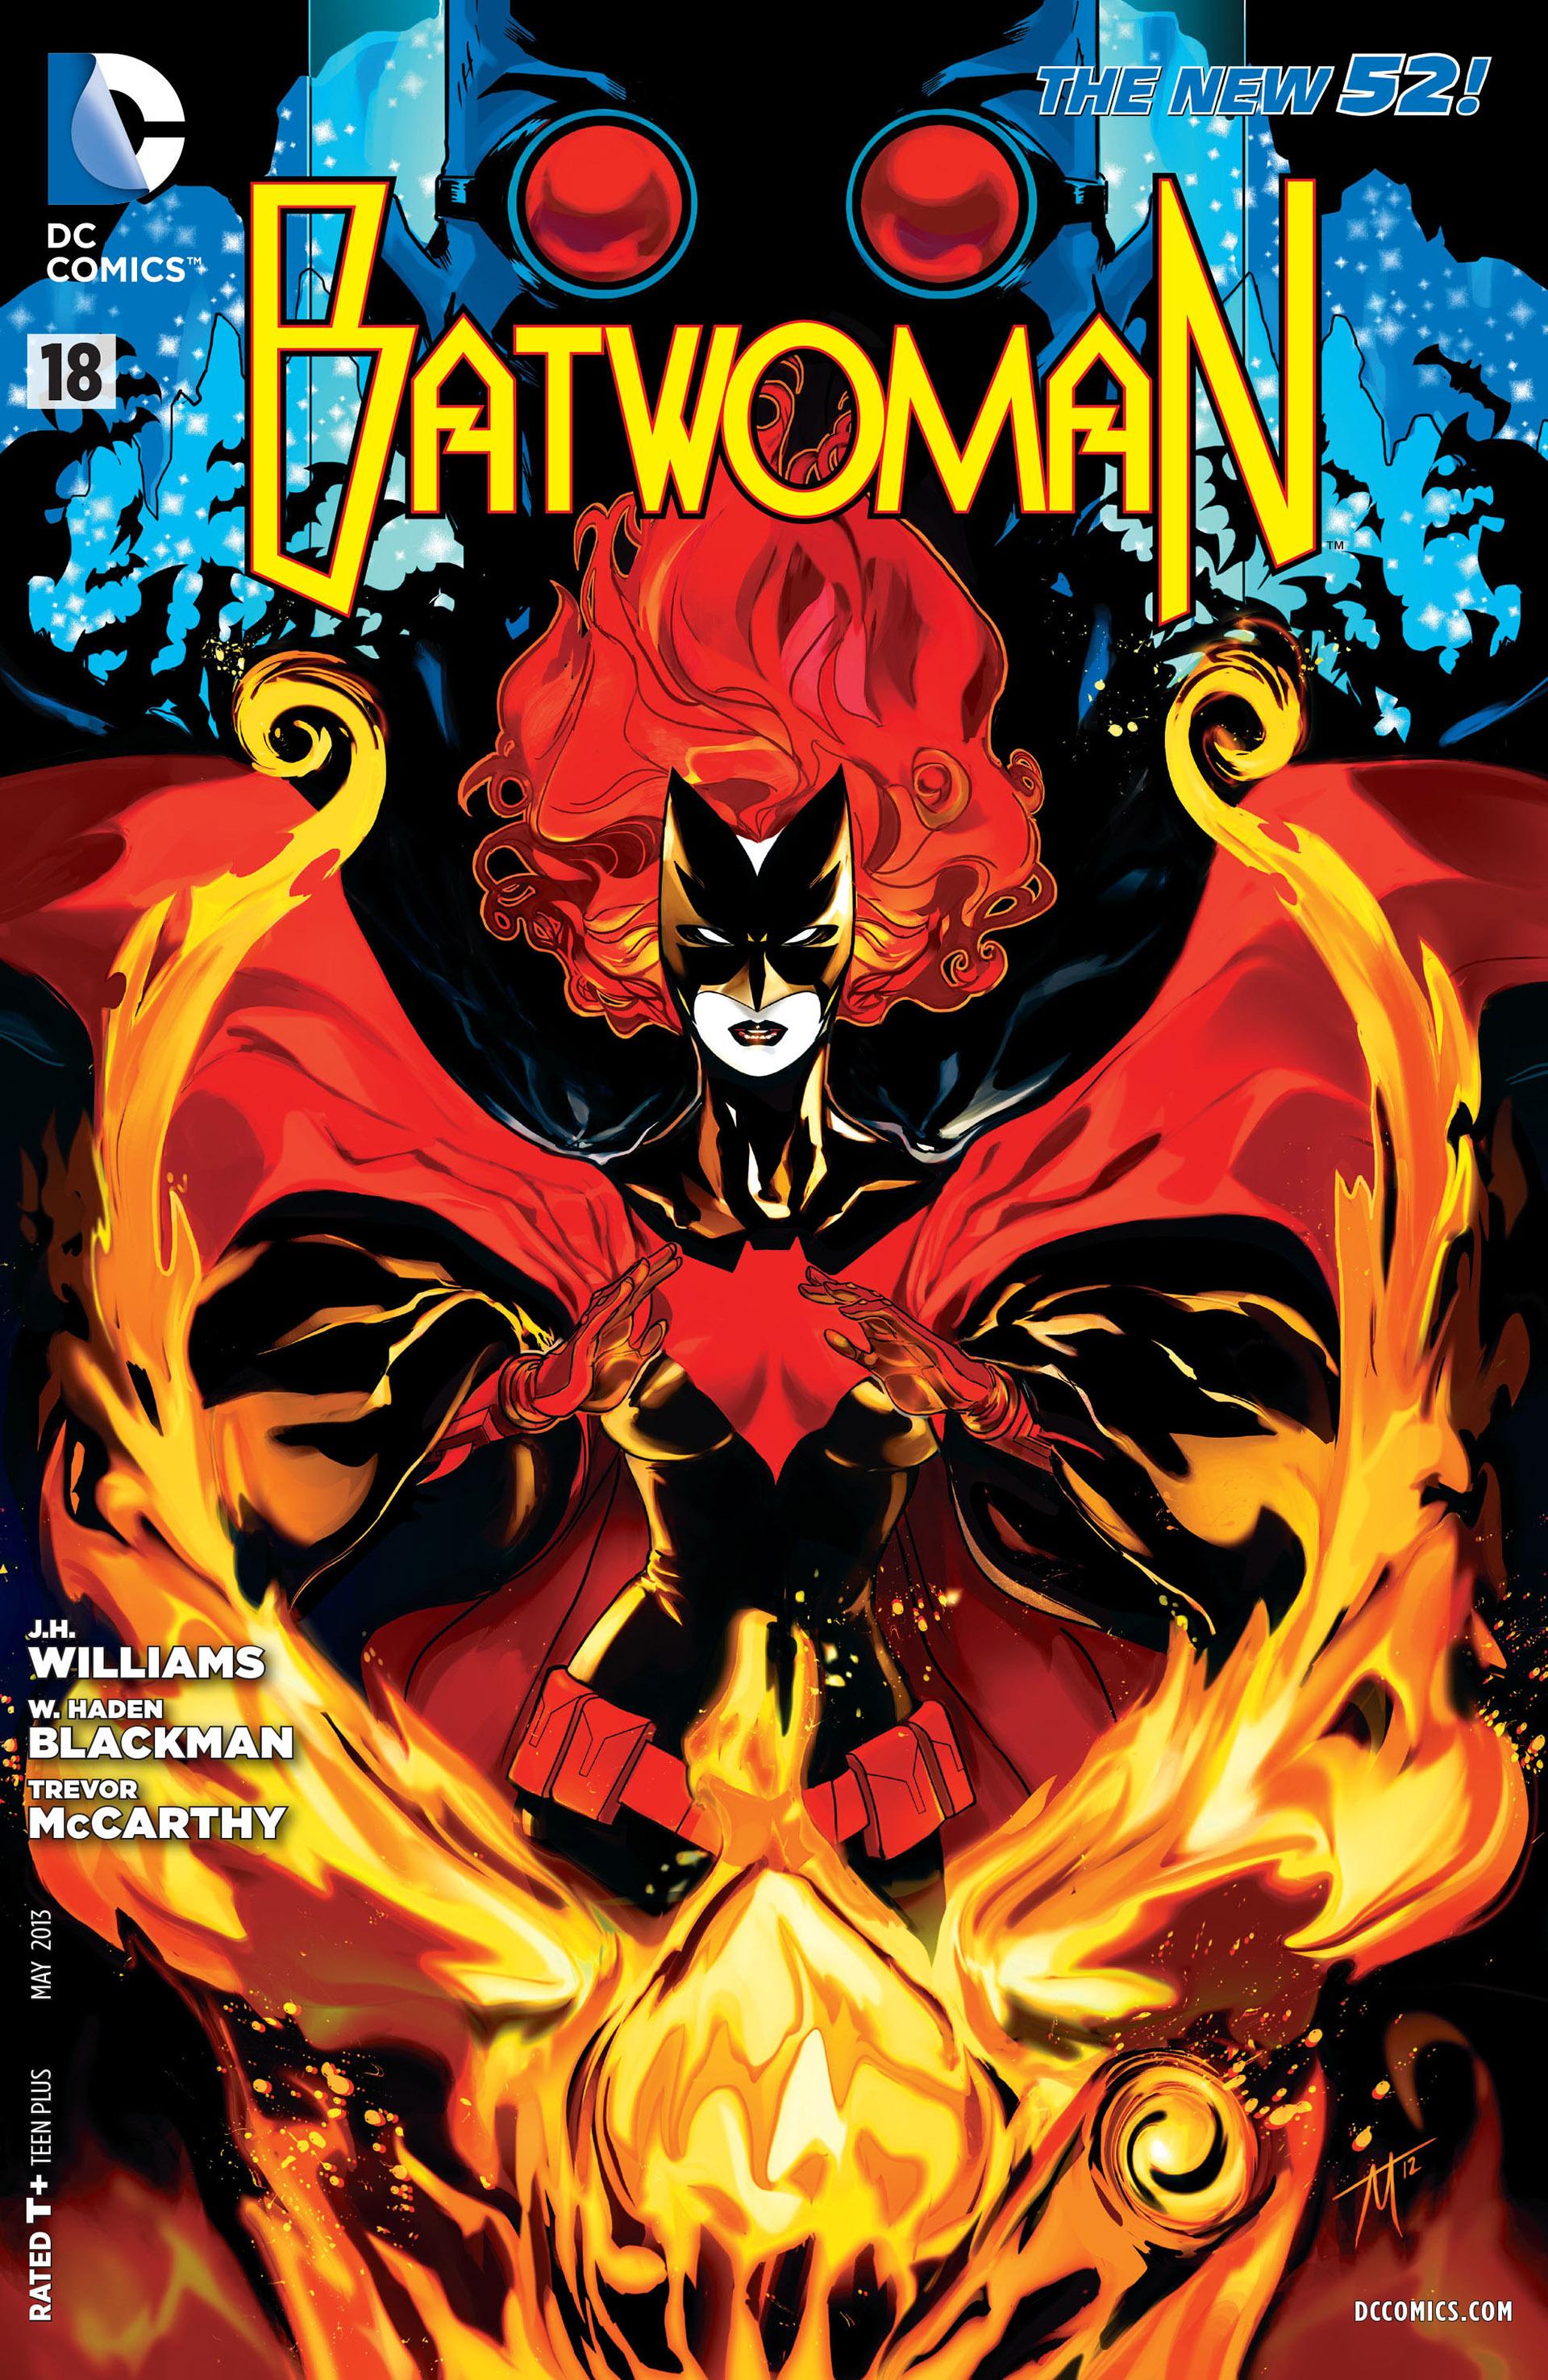 Batwoman New 52 Vol 2 File:batwoman Vol 2 18.jpg